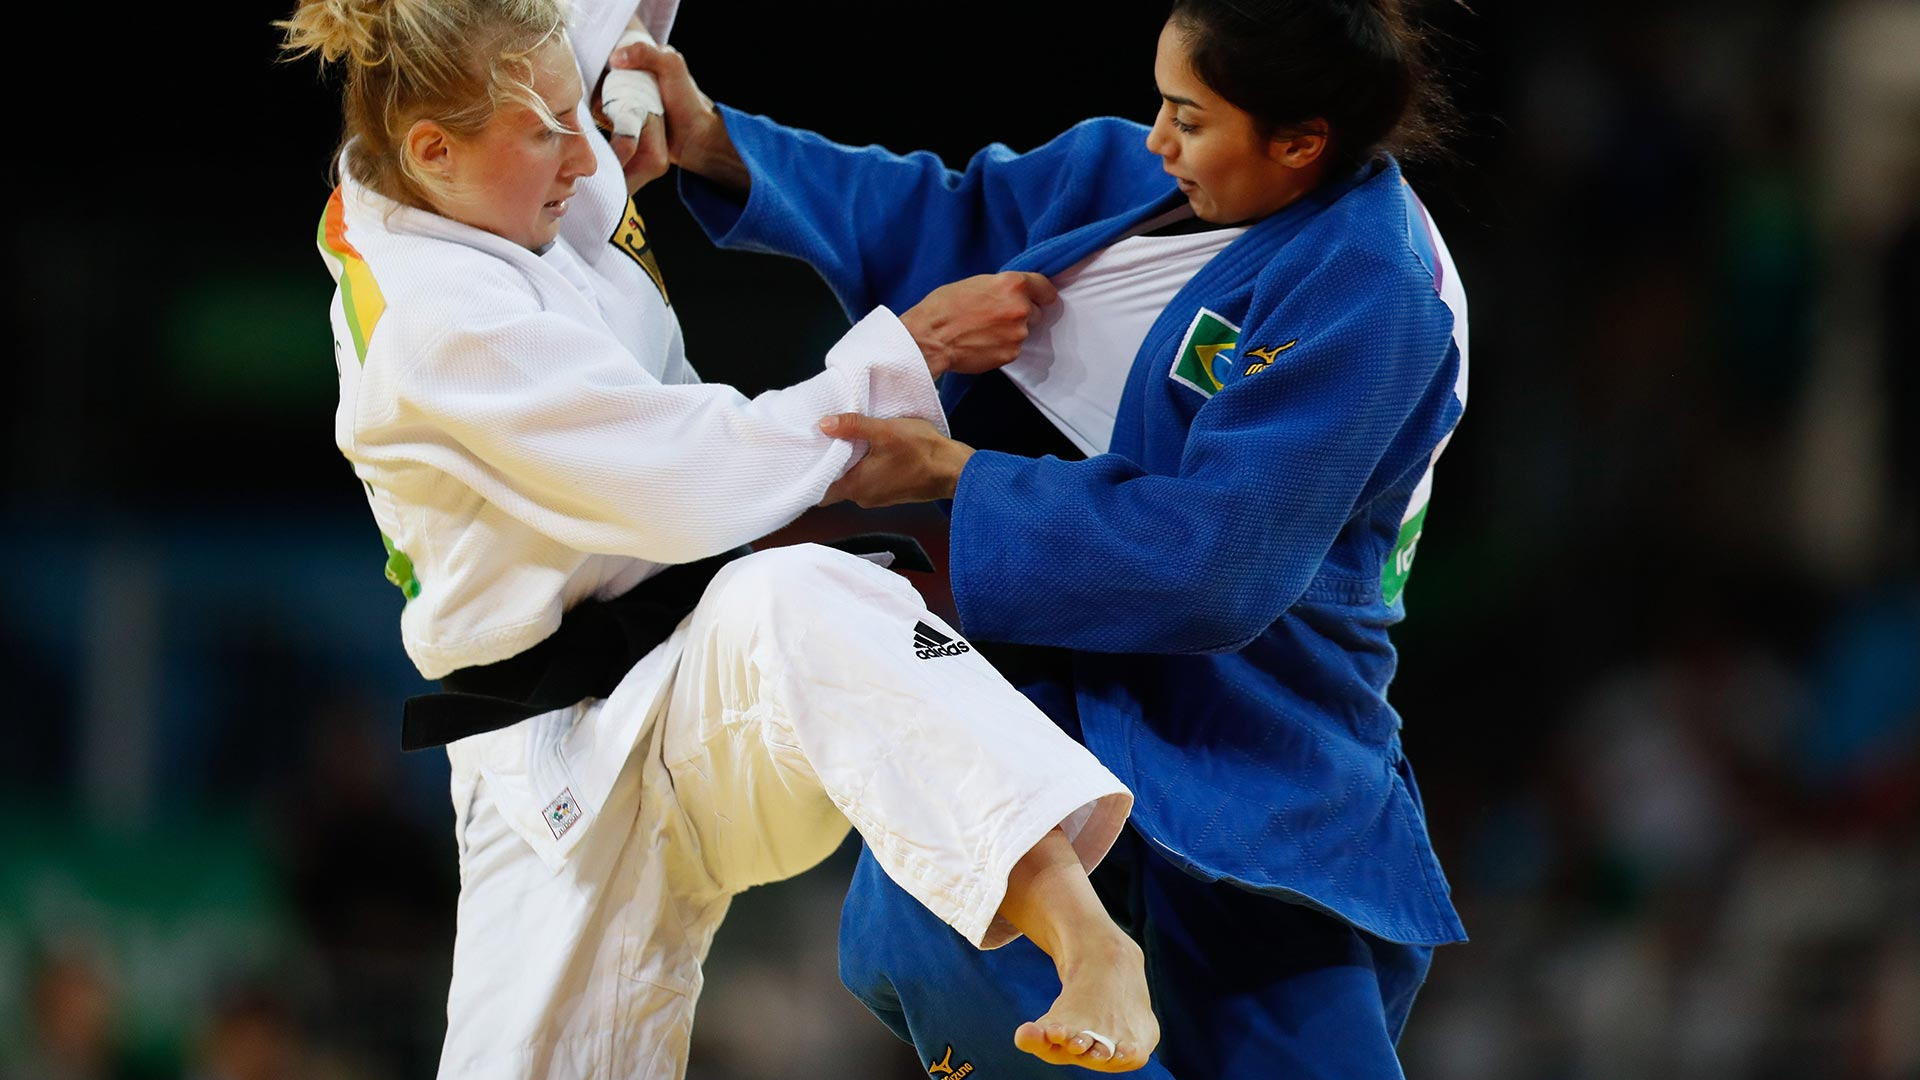 Rio_2016_Judo_1036109-090816judo01756